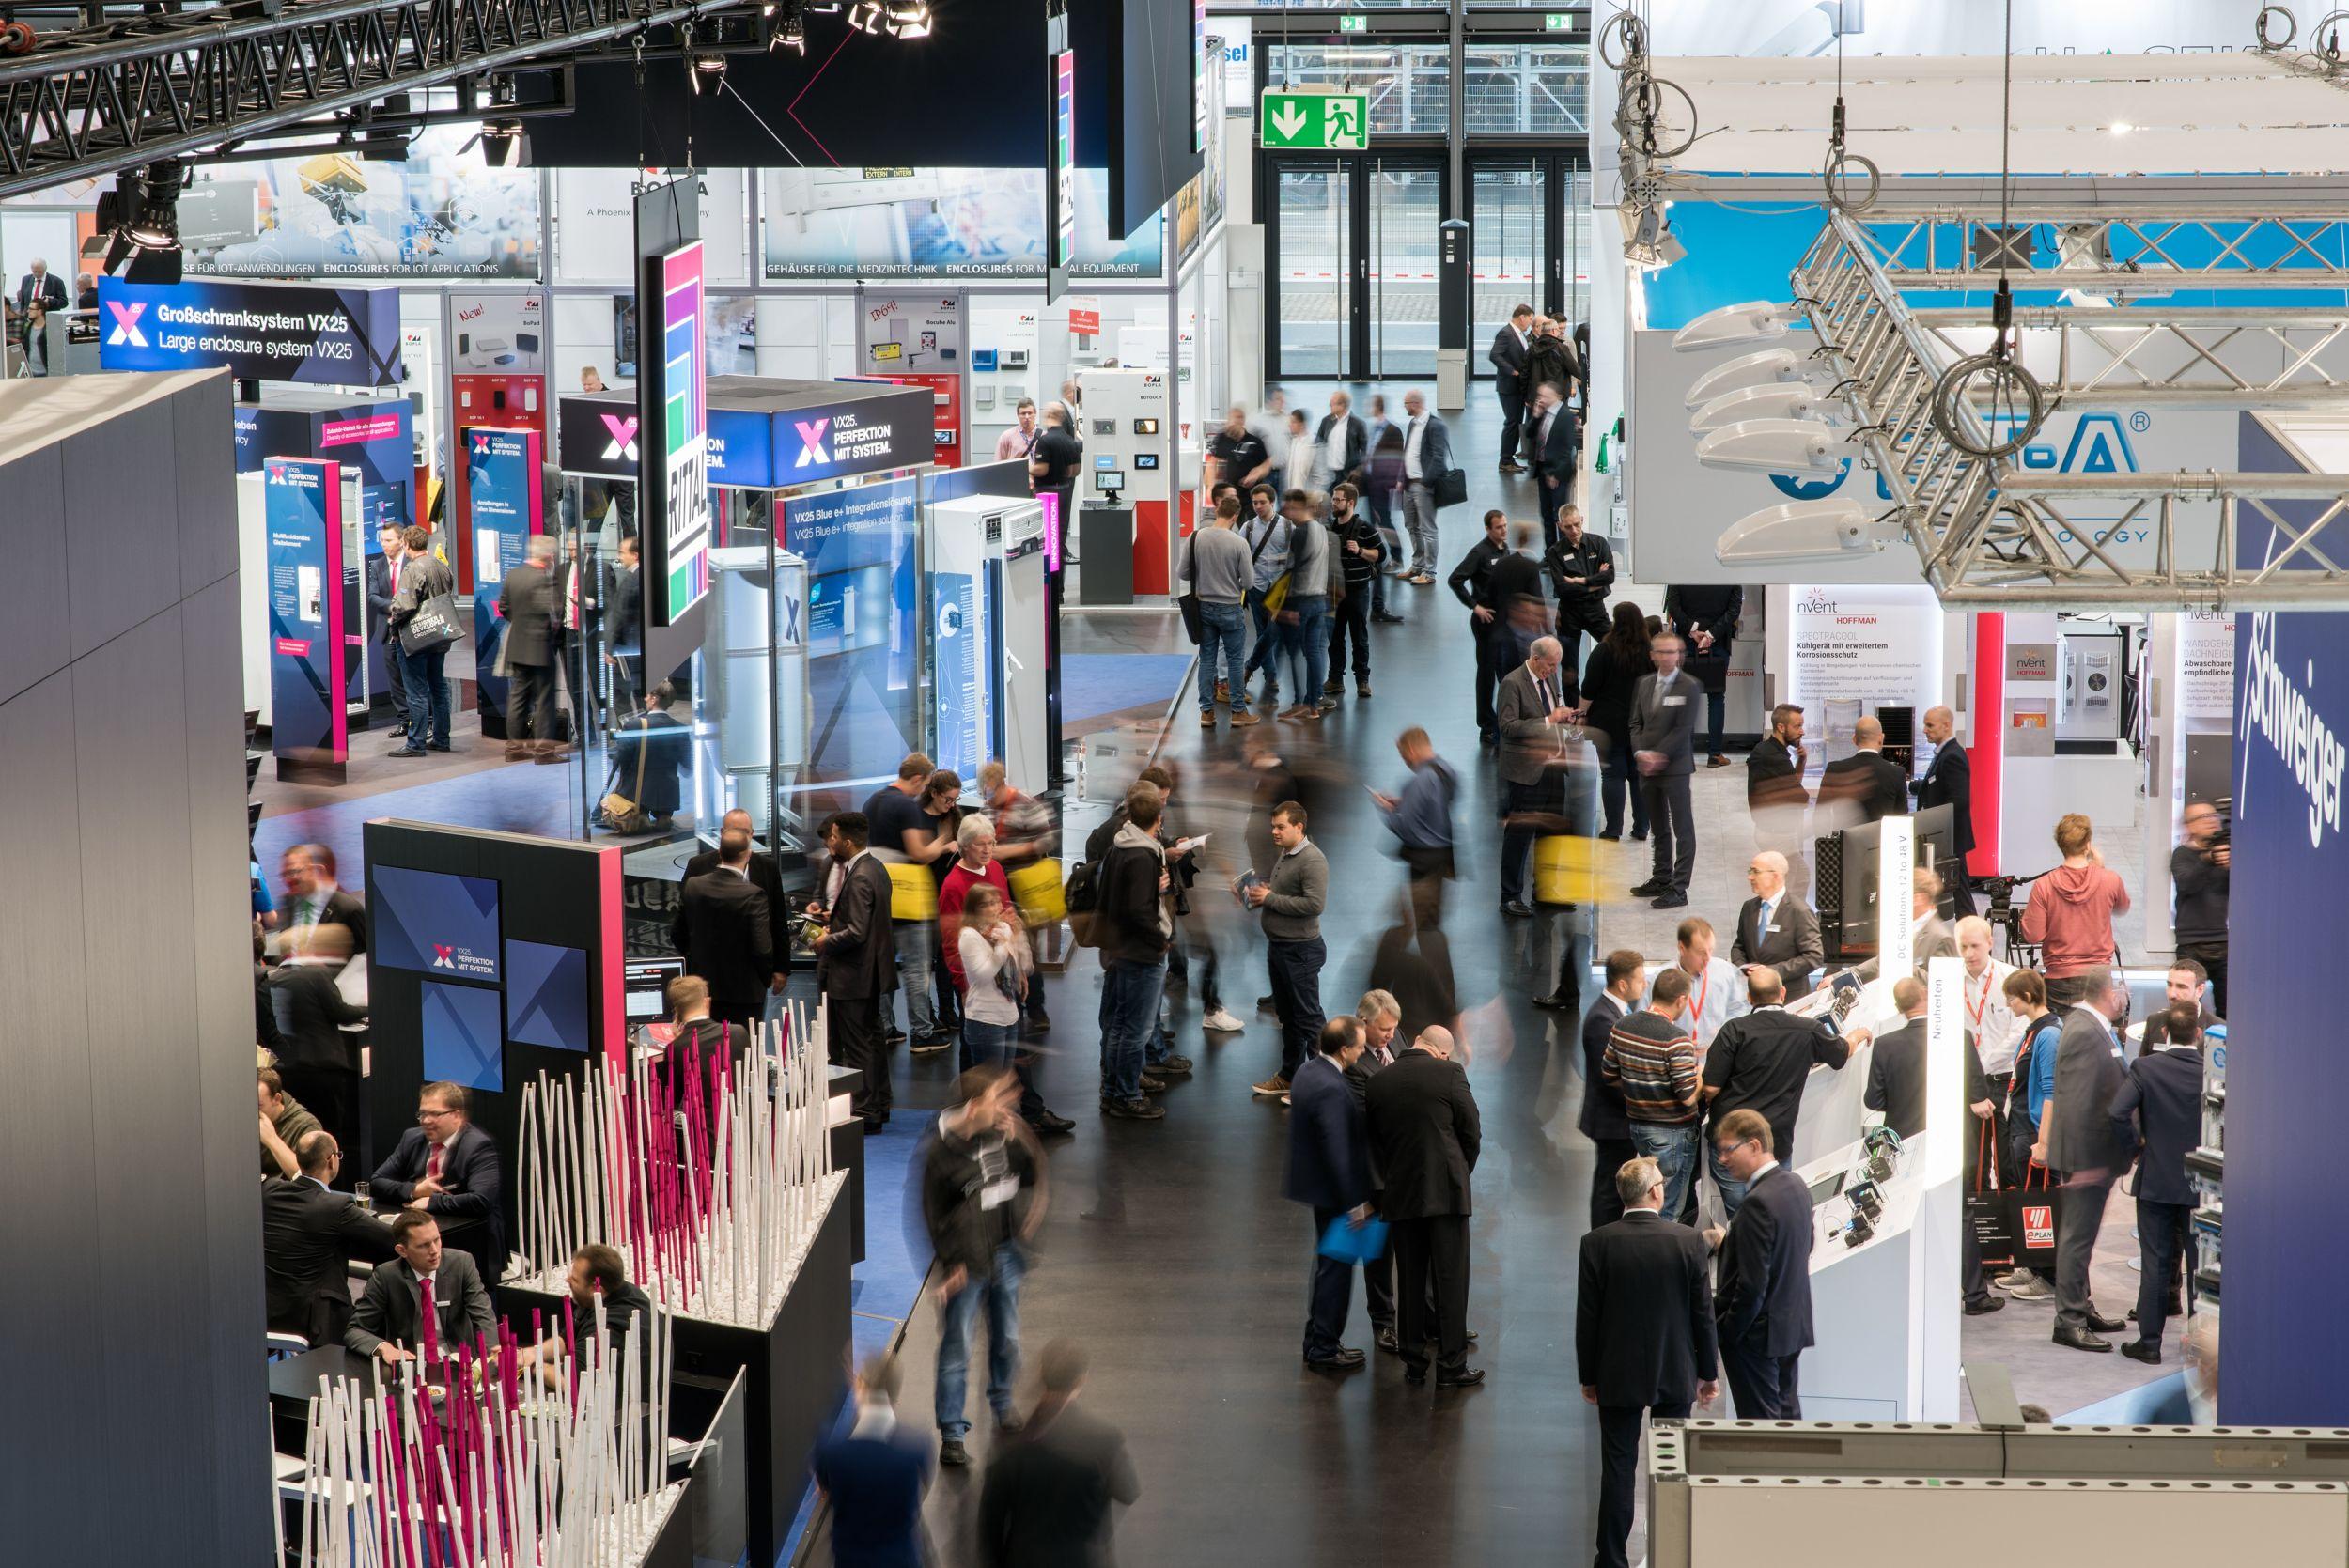 (Bild: Mesago Messe Frankfurt GmbH)